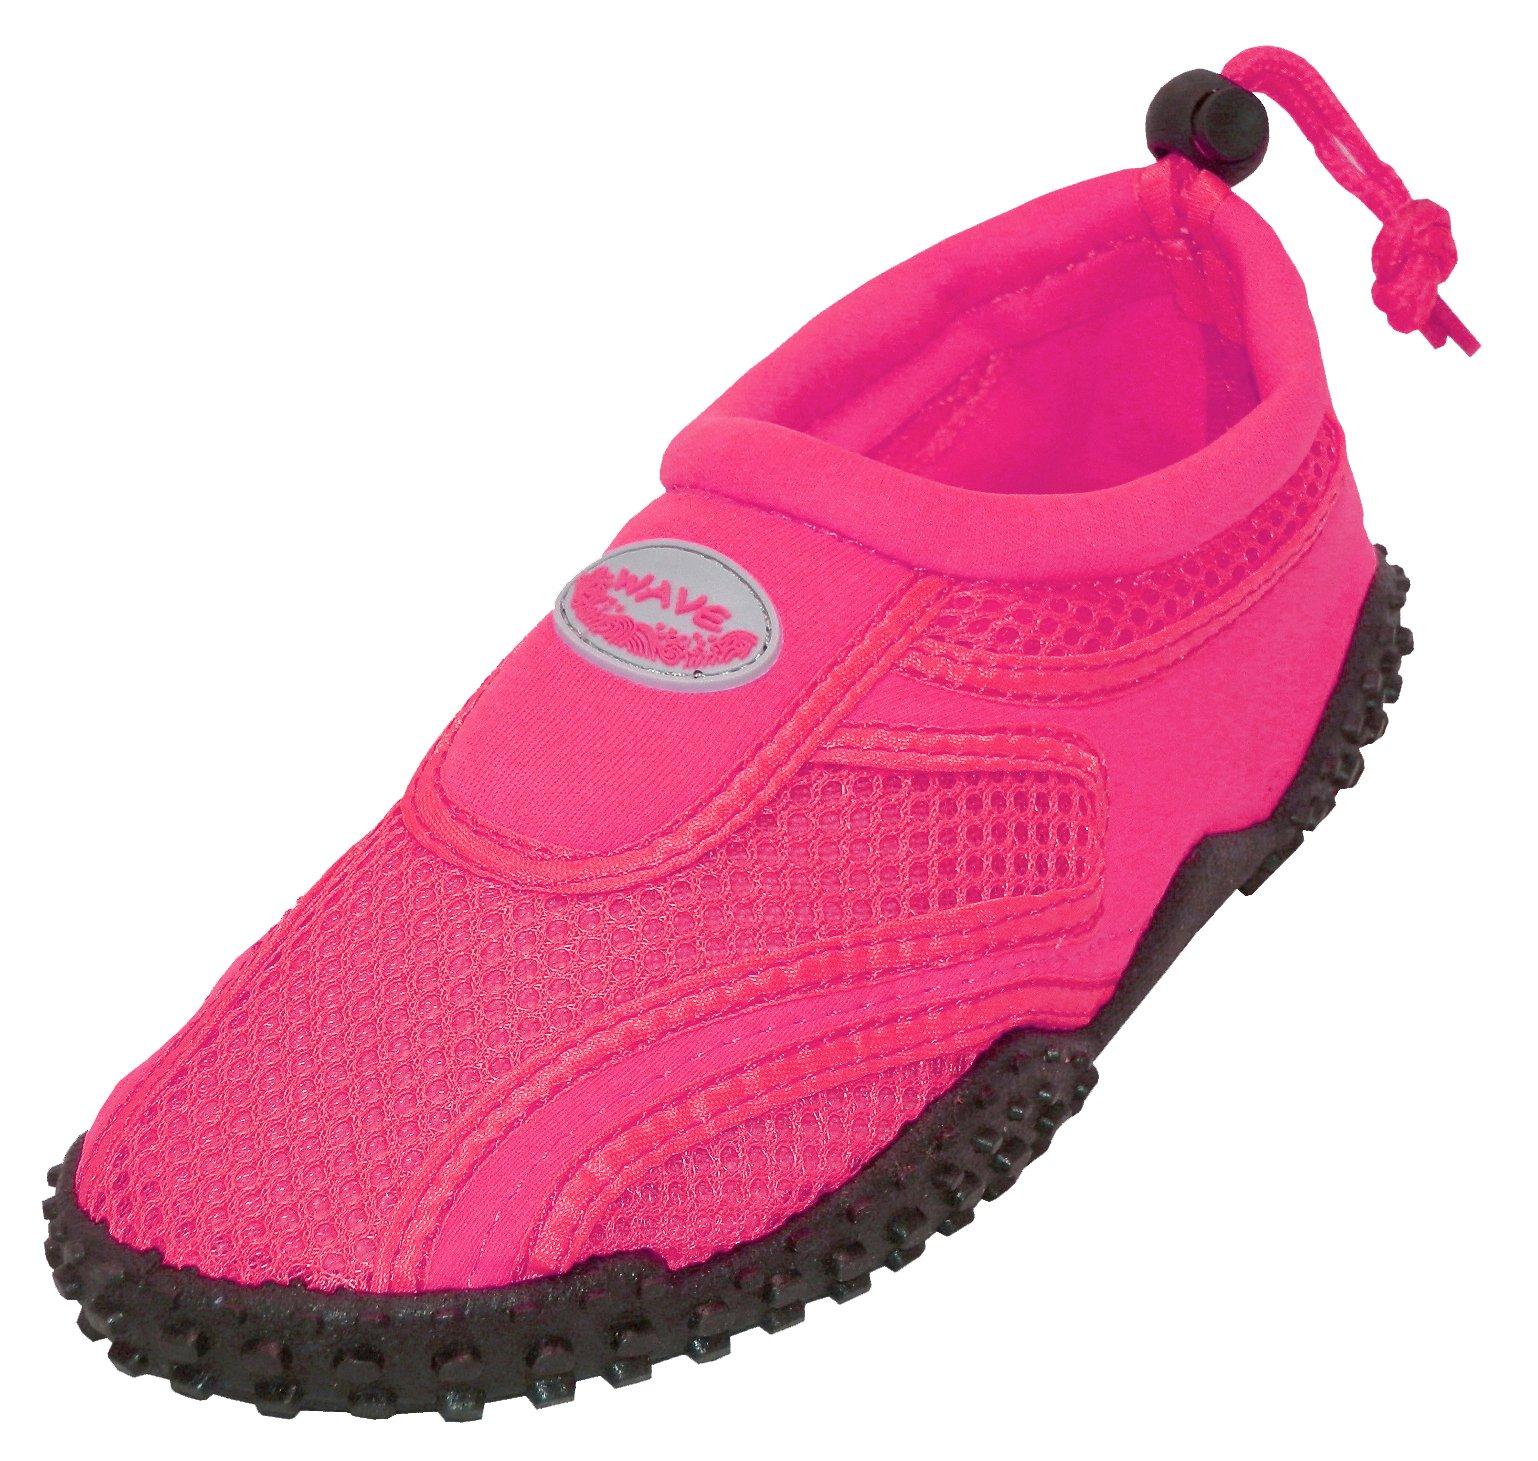 Cambridge Select Kids' Mesh Quick Dry Slip-On Drawstring Non-Slip Water Shoe (Toddler/Little Kid/Big Kid),5 M US Toddler,Neon Fuchsia